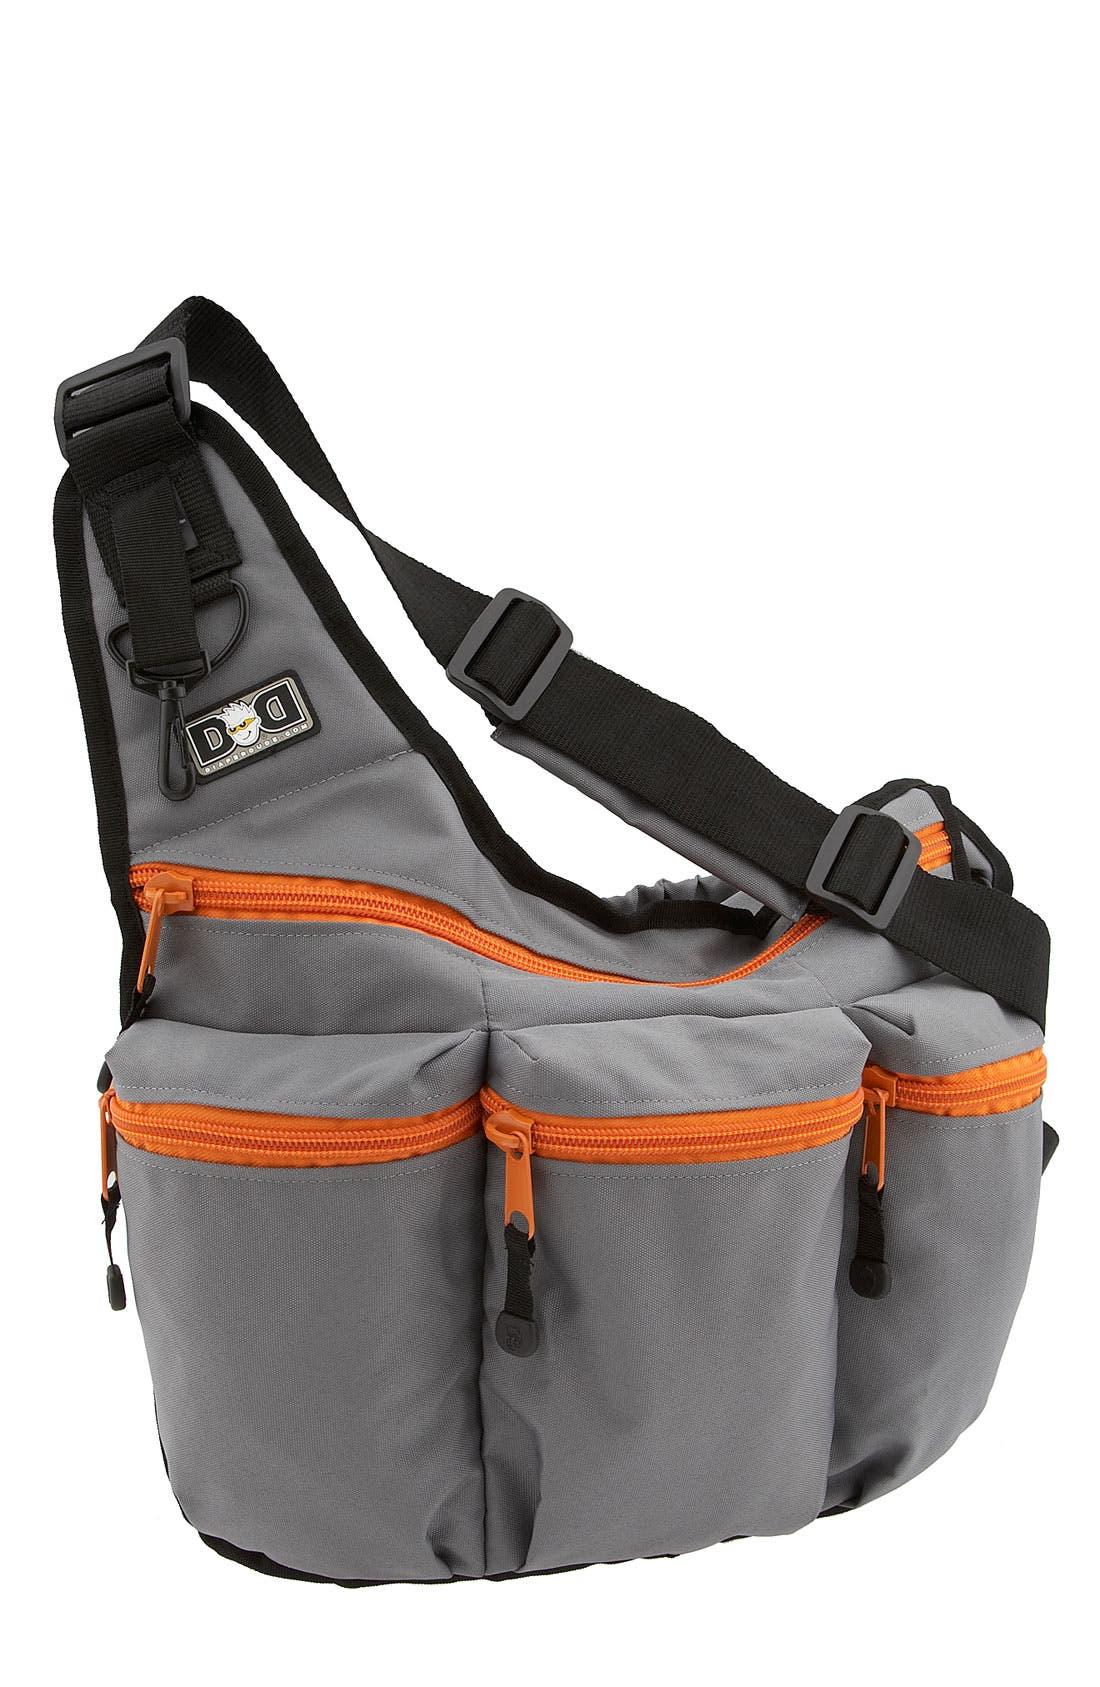 Main Image - Diaper Dude Shoulder Messenger Bag